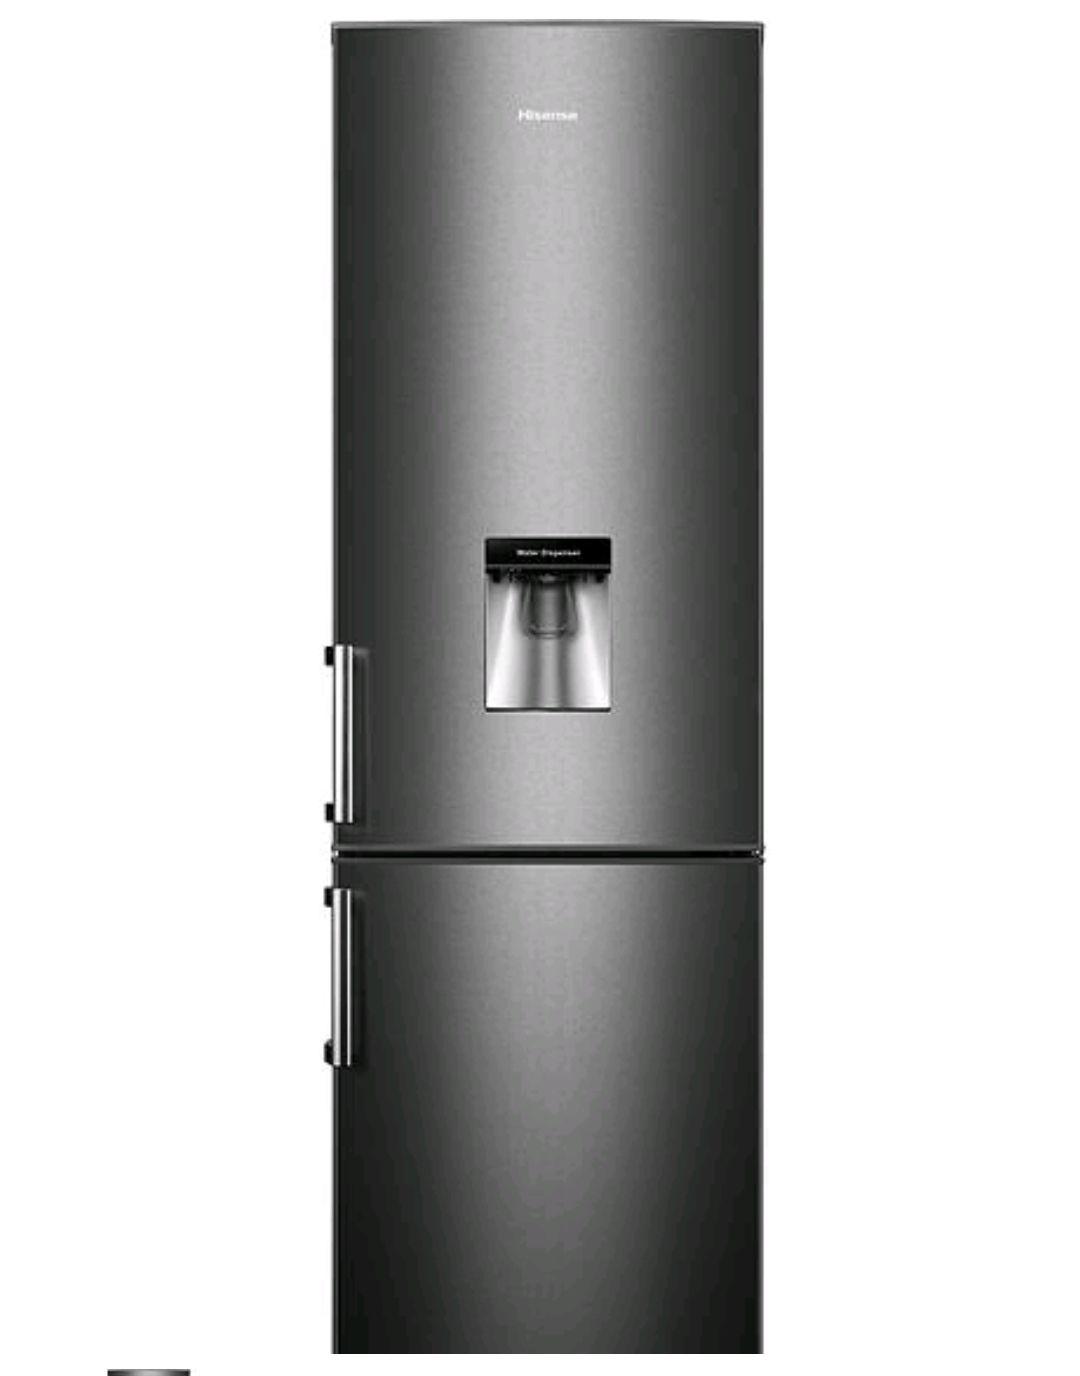 fridgemaster 70 30 fridge freezer 224 boots hotukdeals. Black Bedroom Furniture Sets. Home Design Ideas